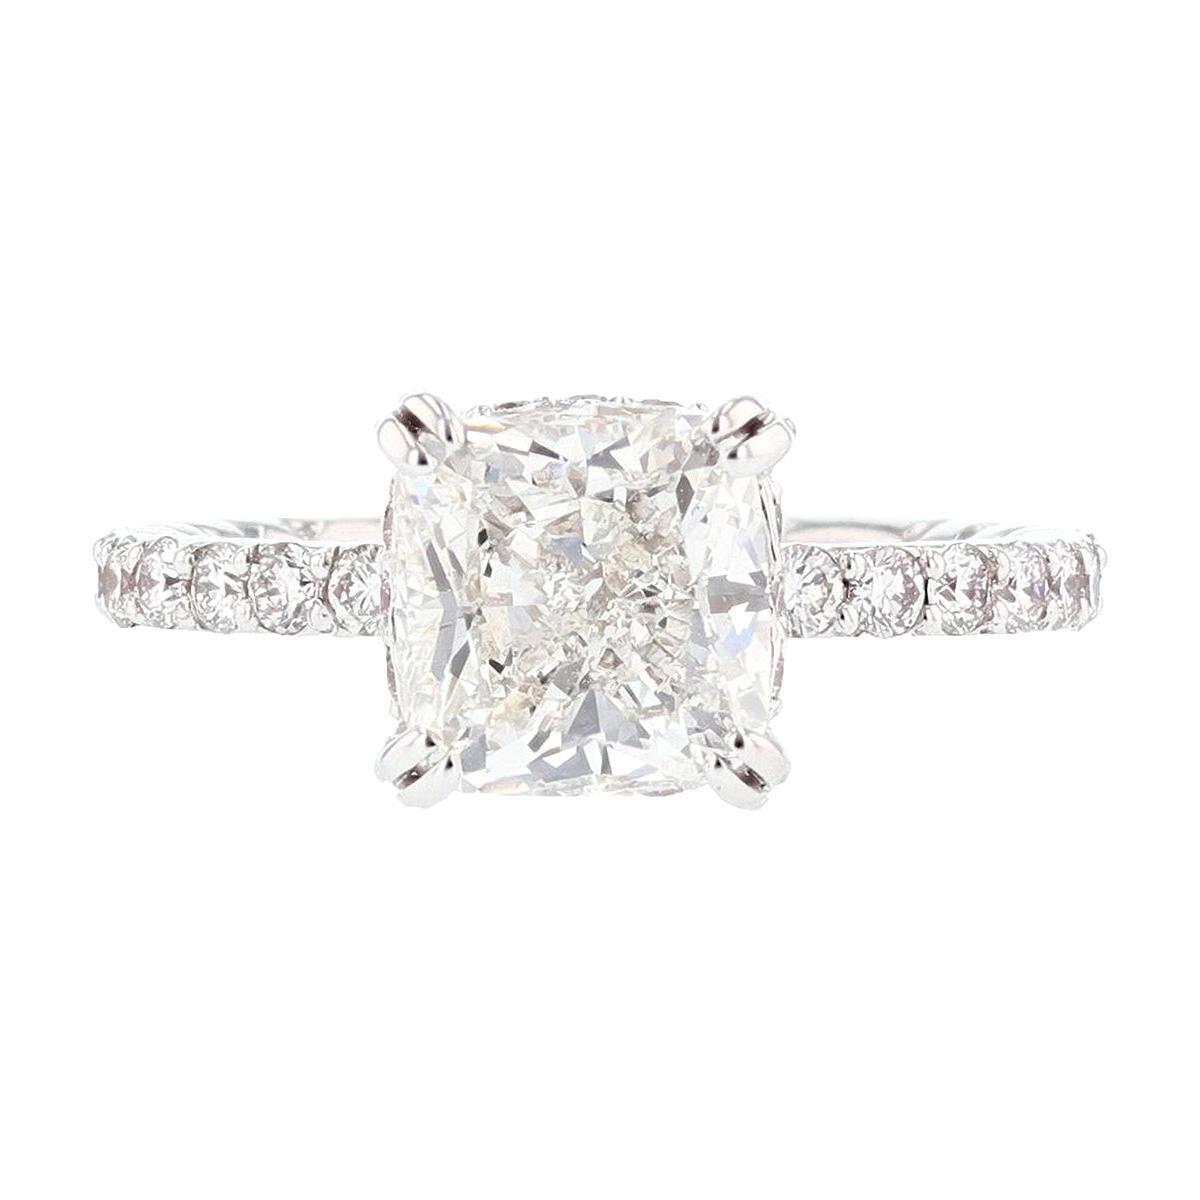 Nazarelle GIA Certified 2.70 Carat Cushion Cut Diamond Engagement Ring